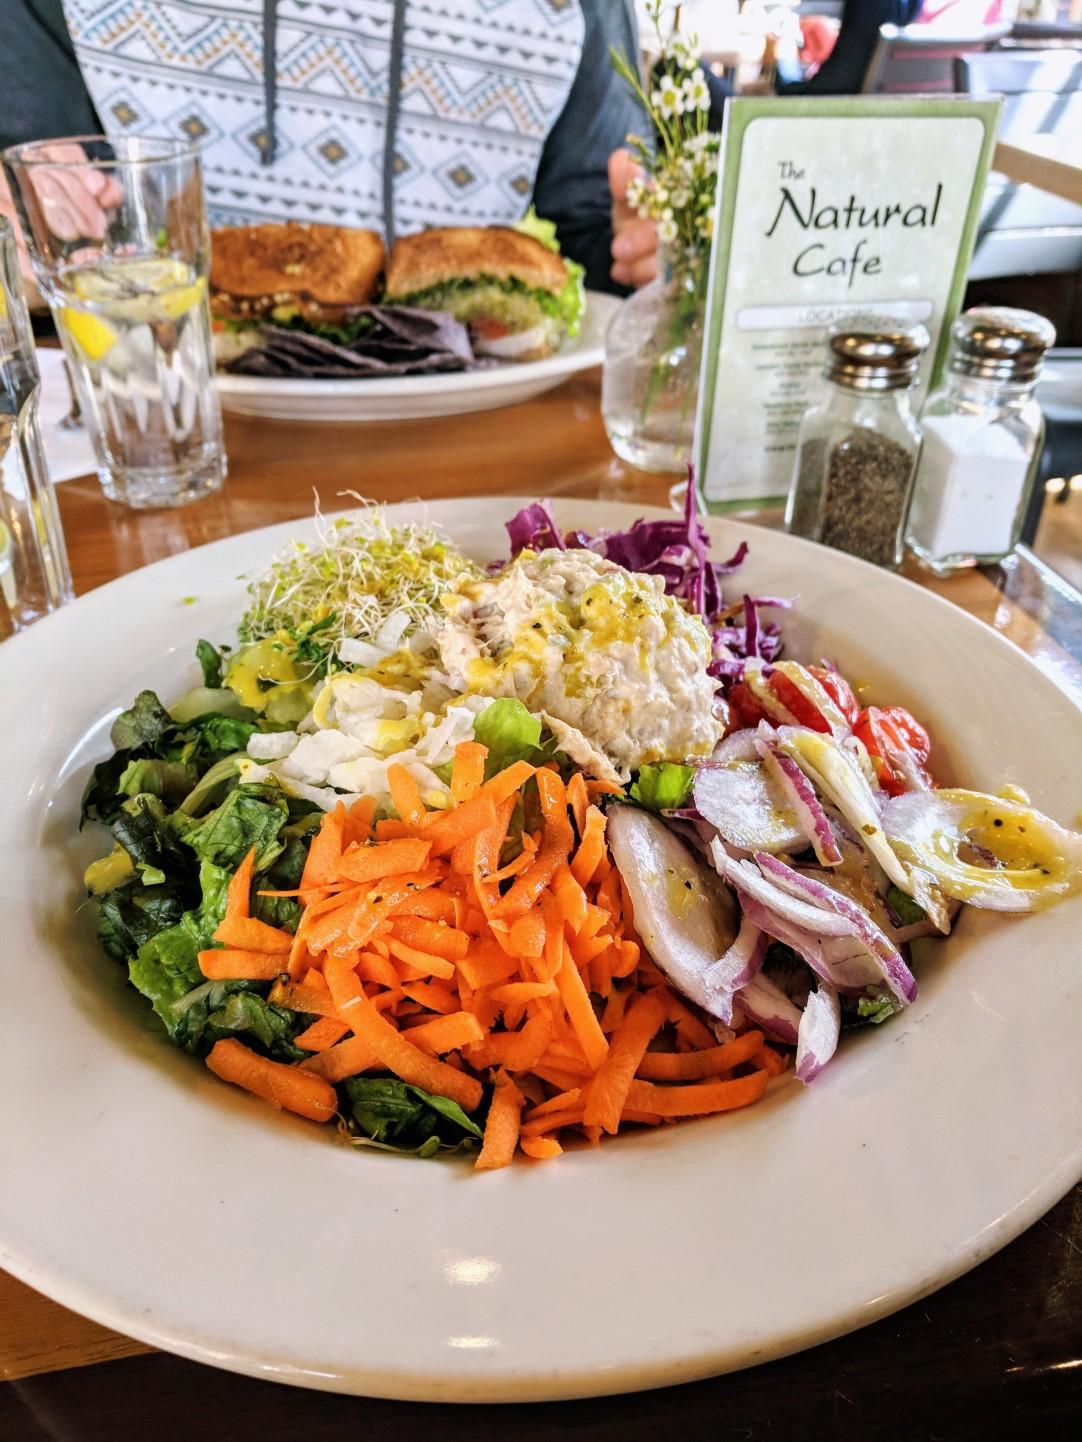 My favorite salad at Natural Cafe